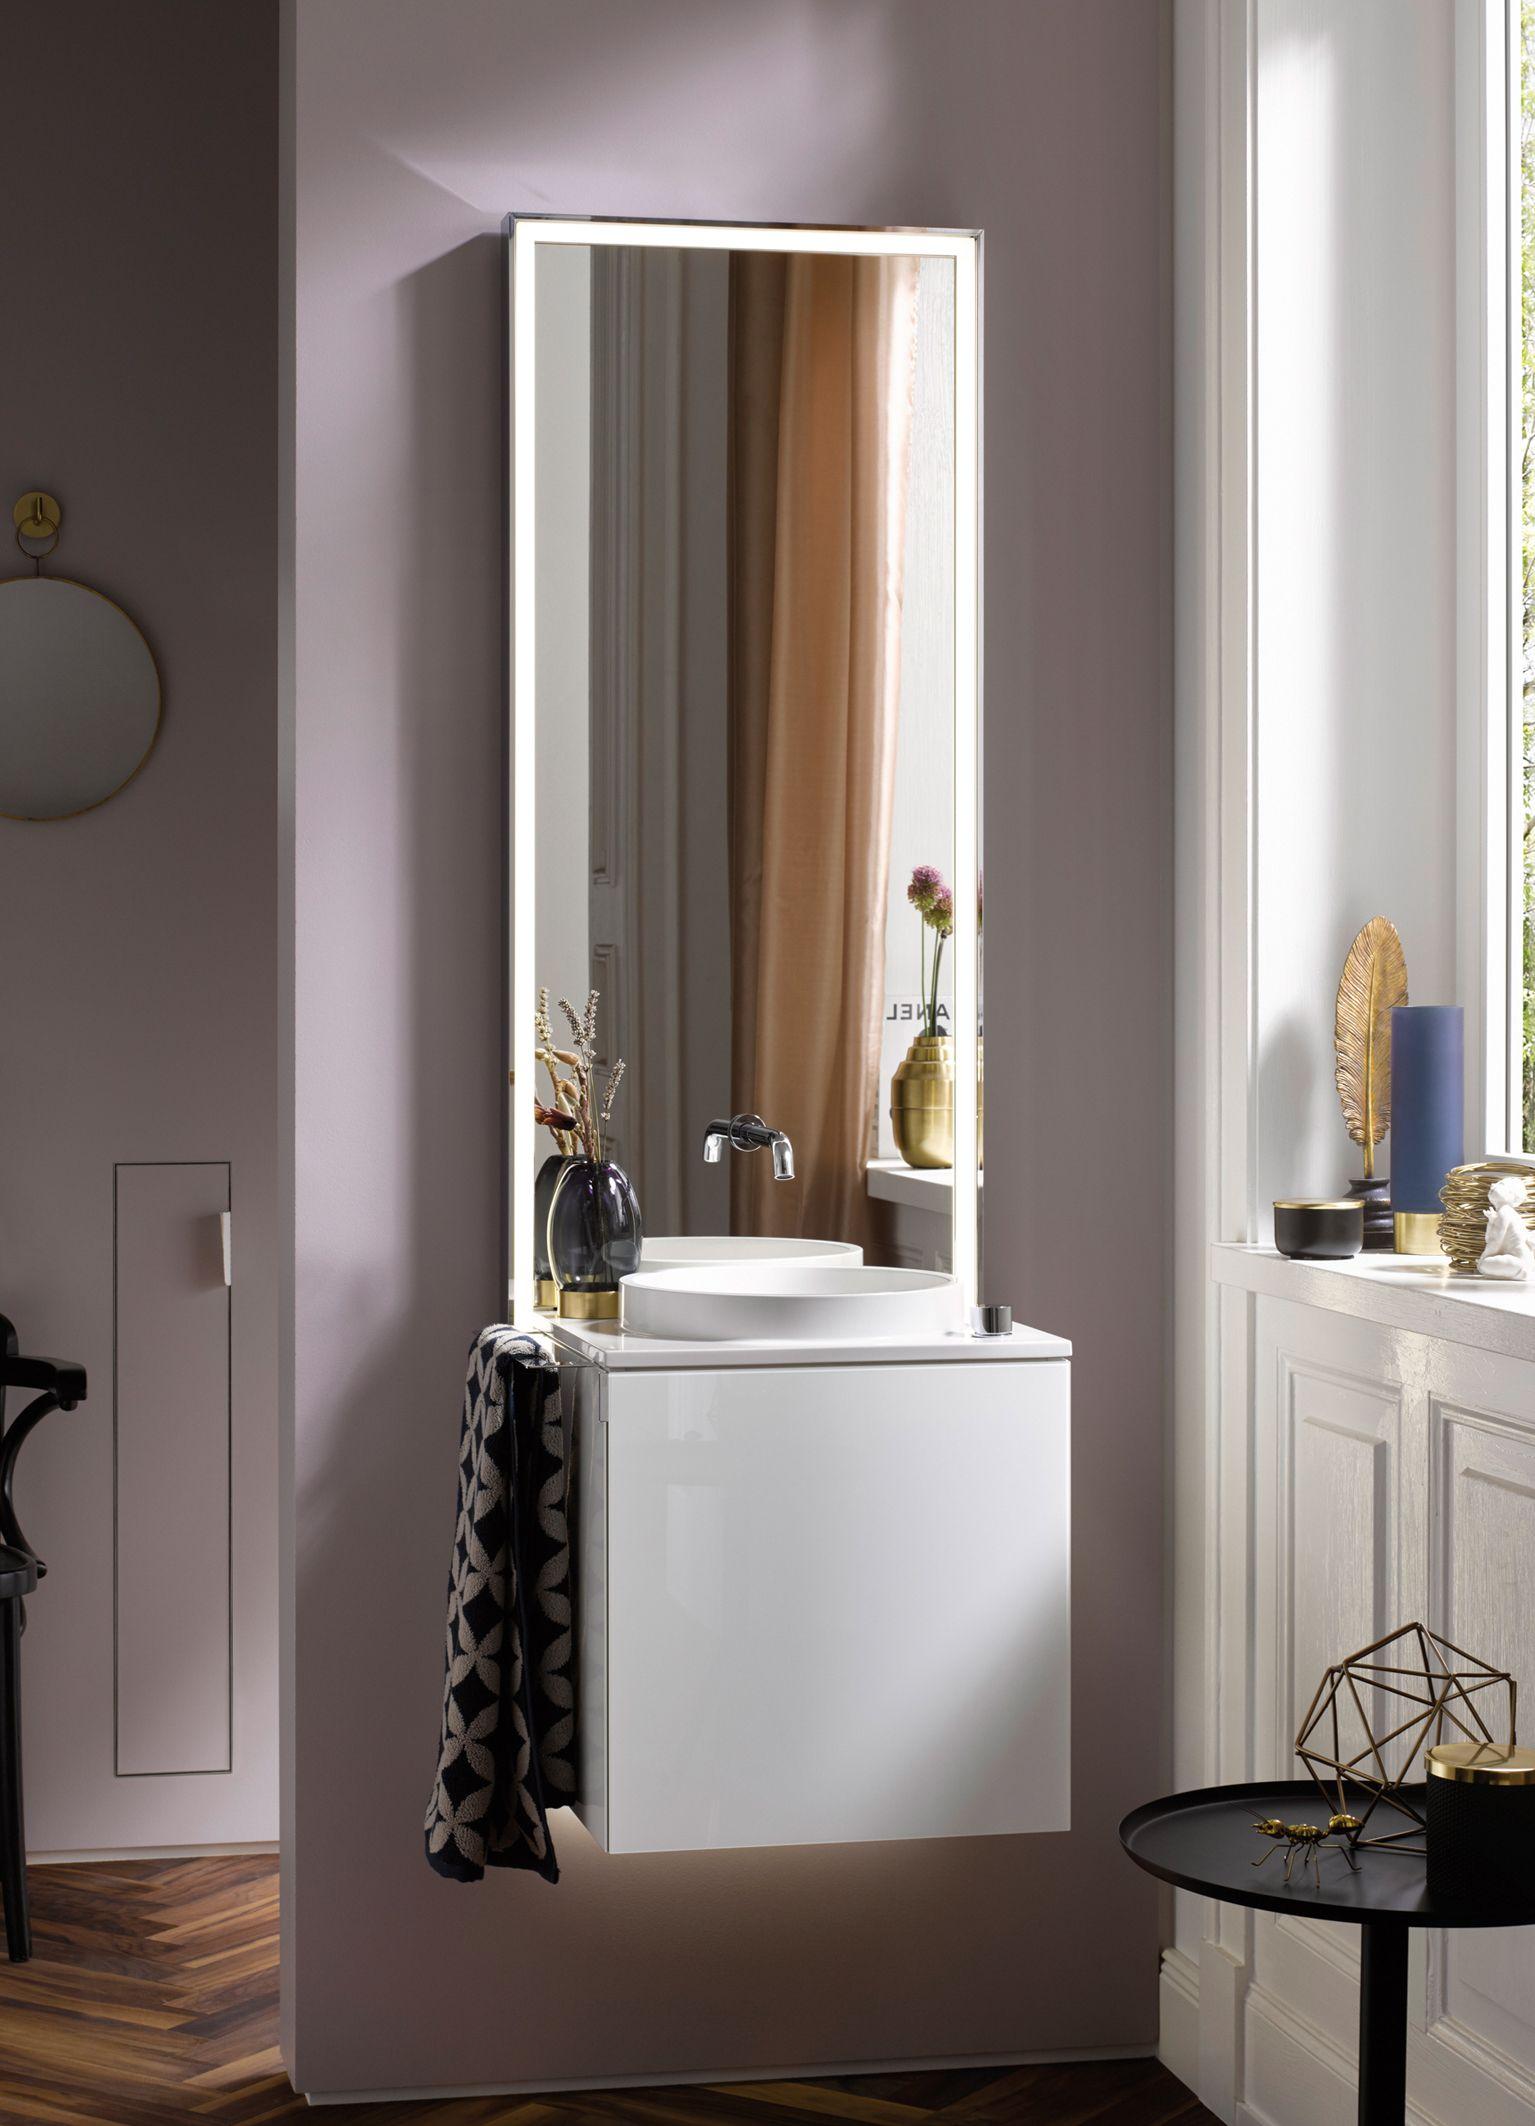 7a83089515b touch slim, minimalisme op zijn hoogtepunt. compleet badkamermeubel met  spiegel, kraan, LED